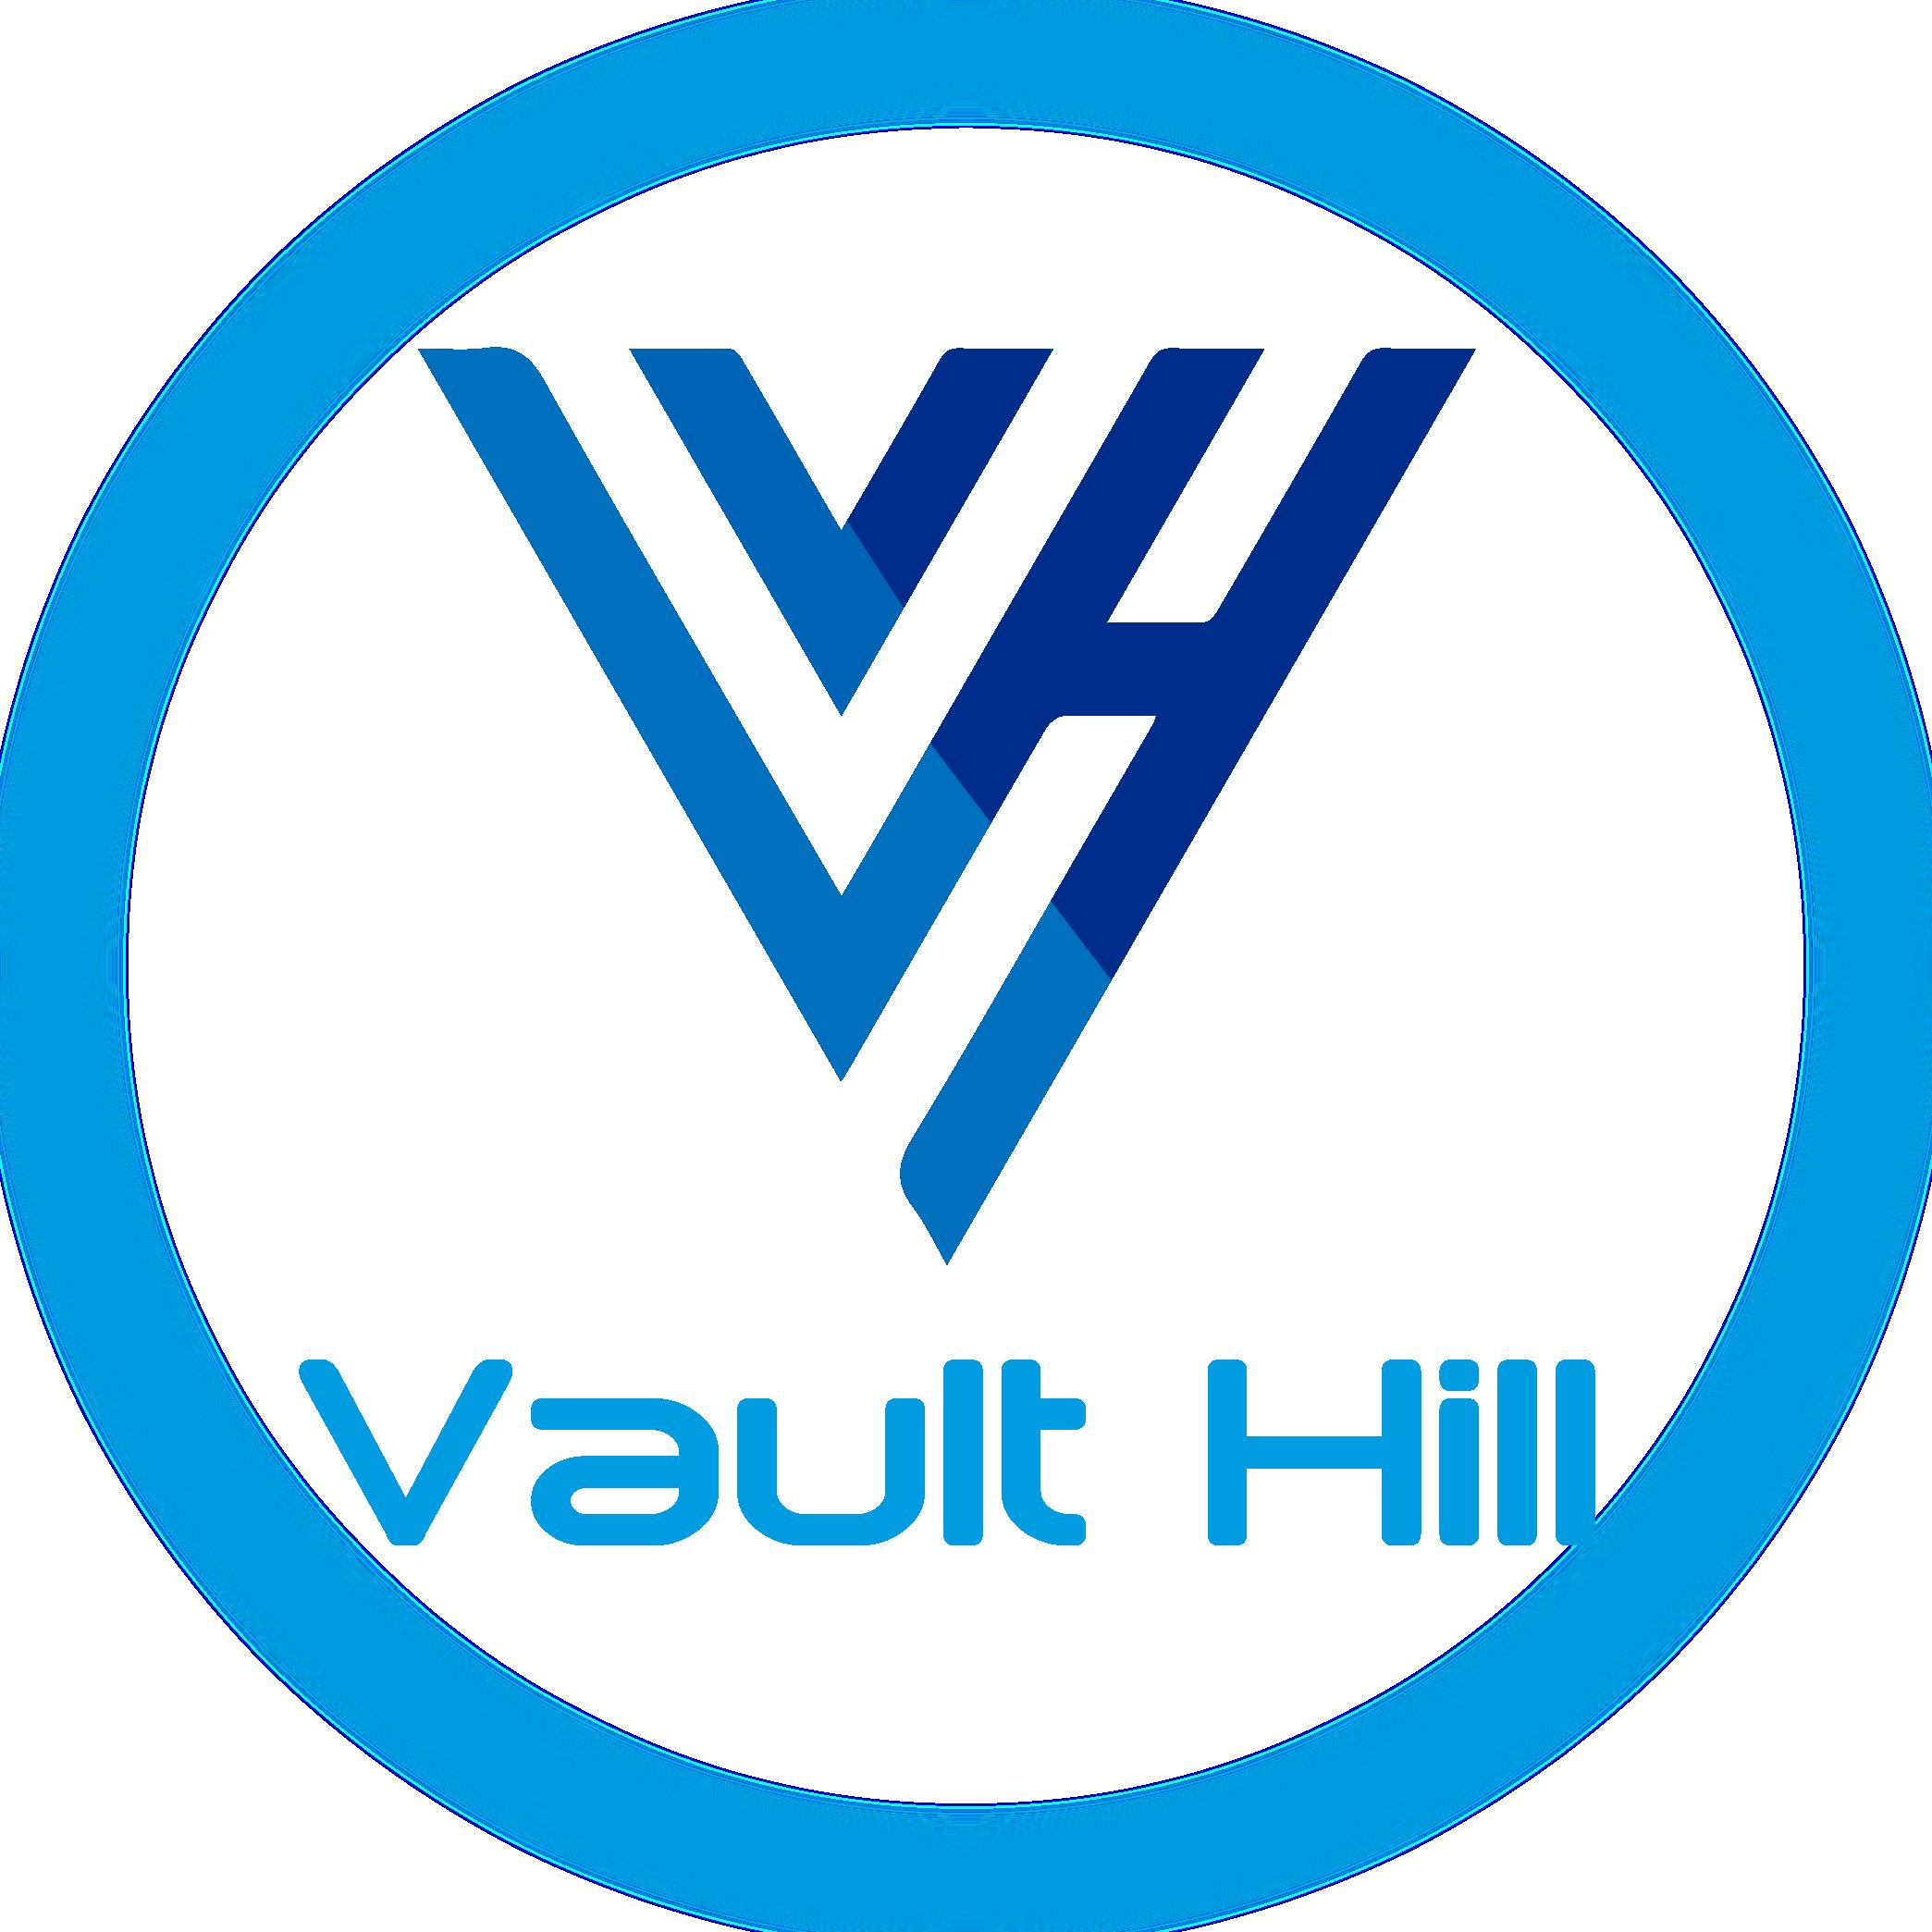 Vault Hill